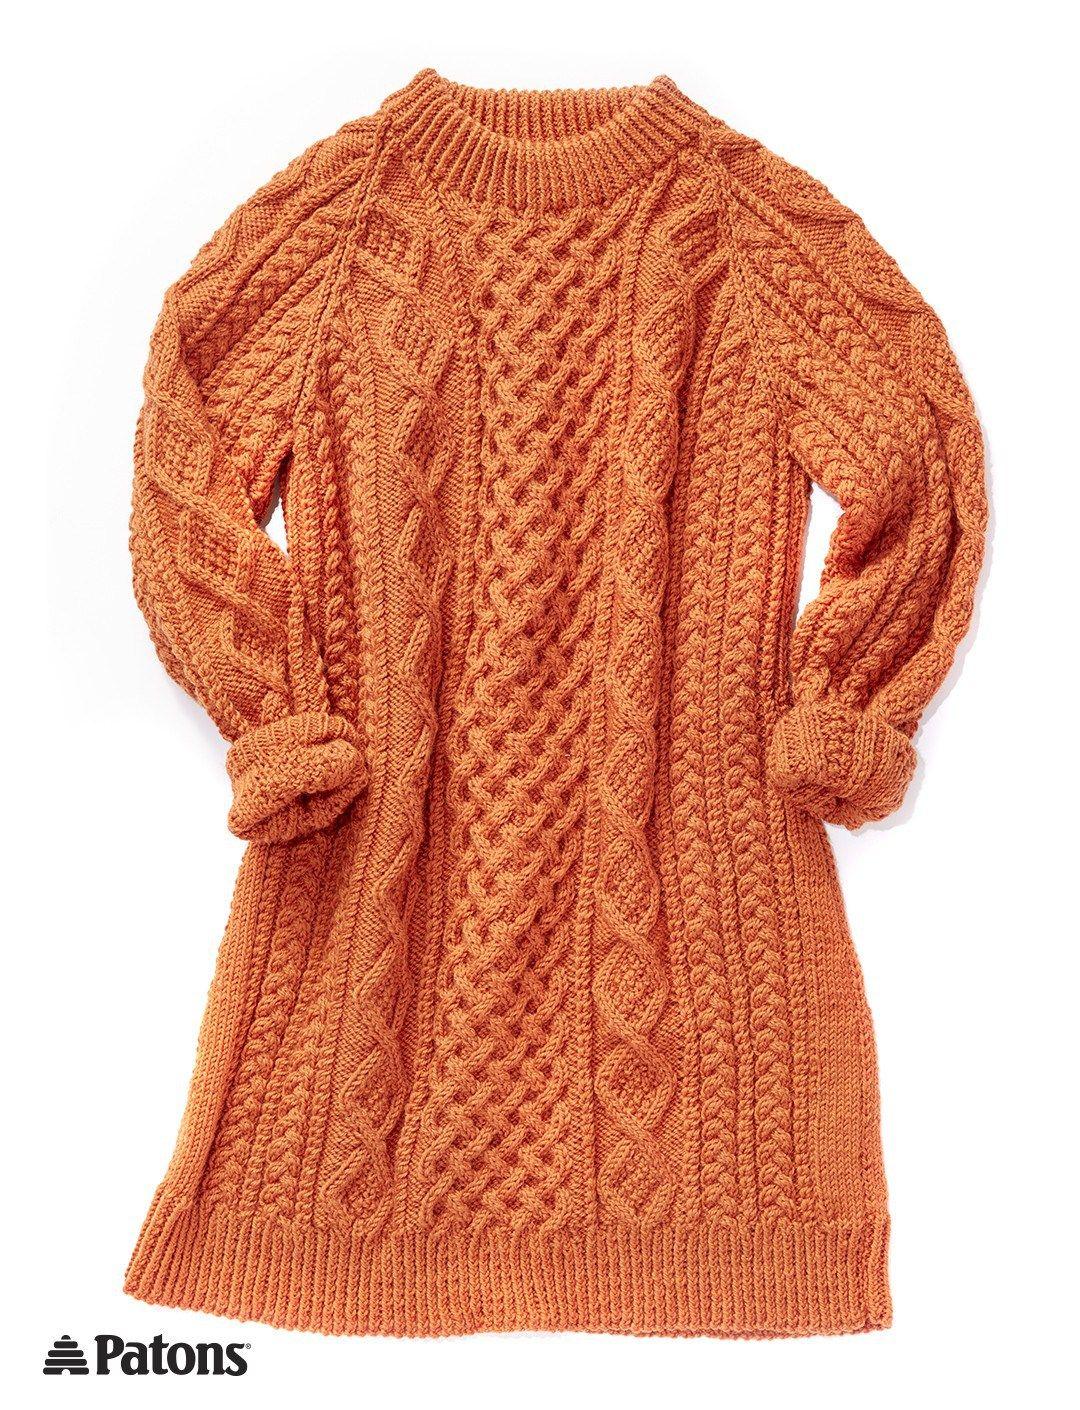 Free knitting pattern for Honeycomb Aran Sweater Dress                                                                                                                                                                                 More